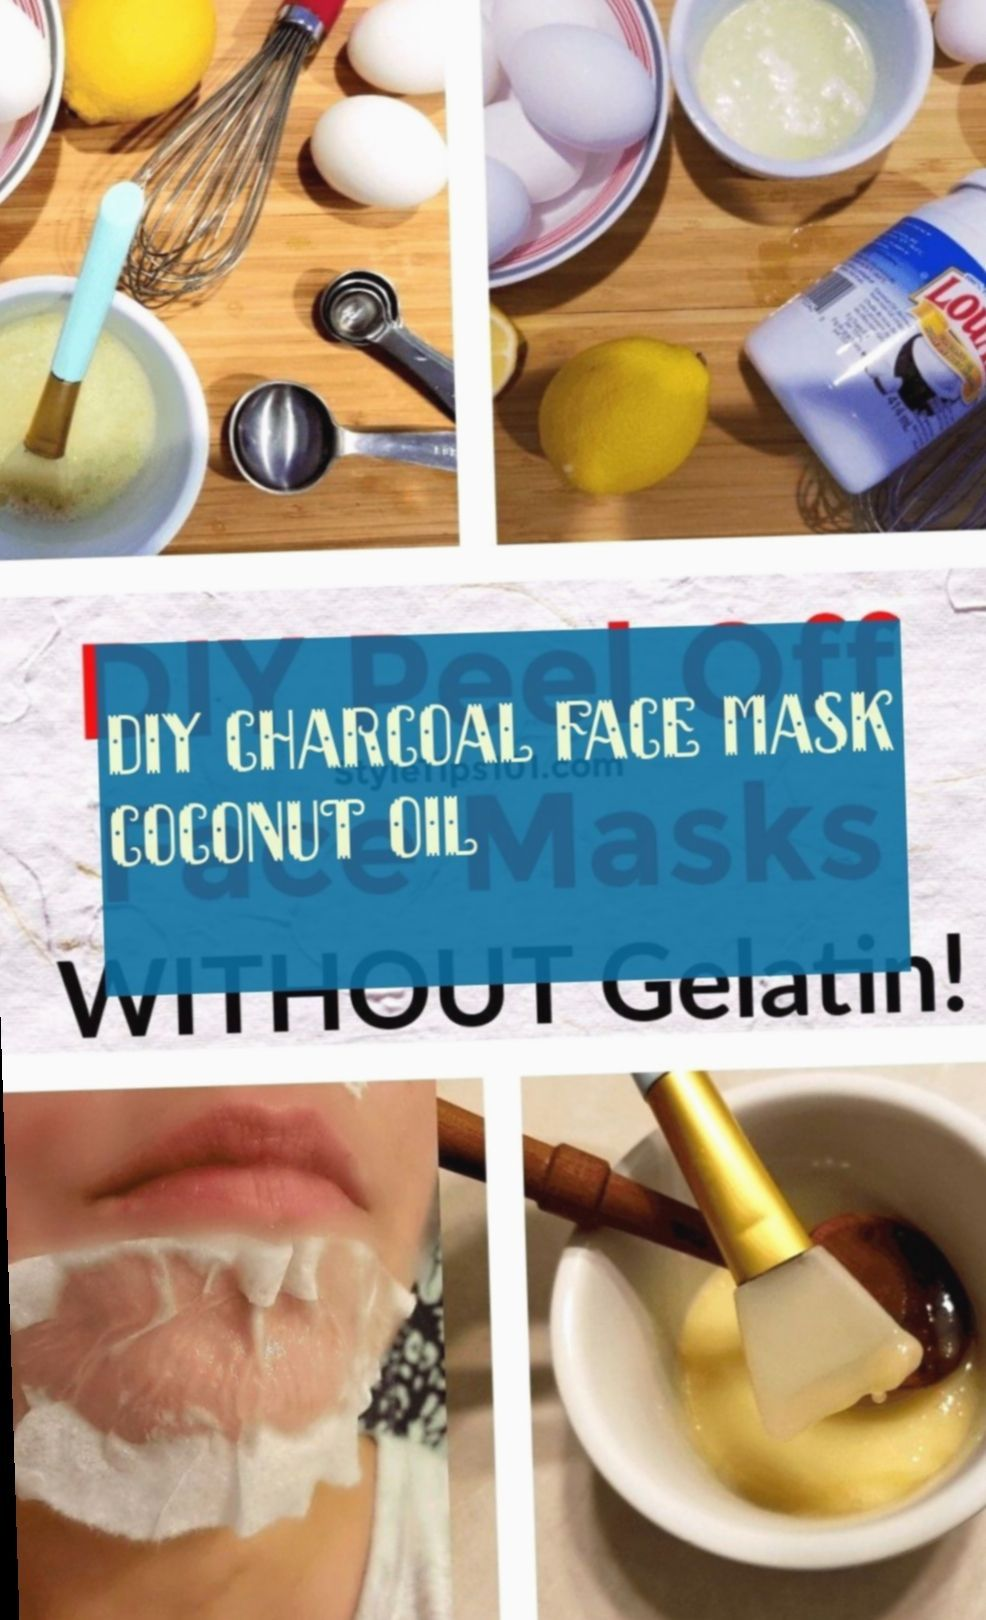 Diy Face Mask Charcoal Coconut Oil  Diy Face Mask Charcoal Coconut Oil